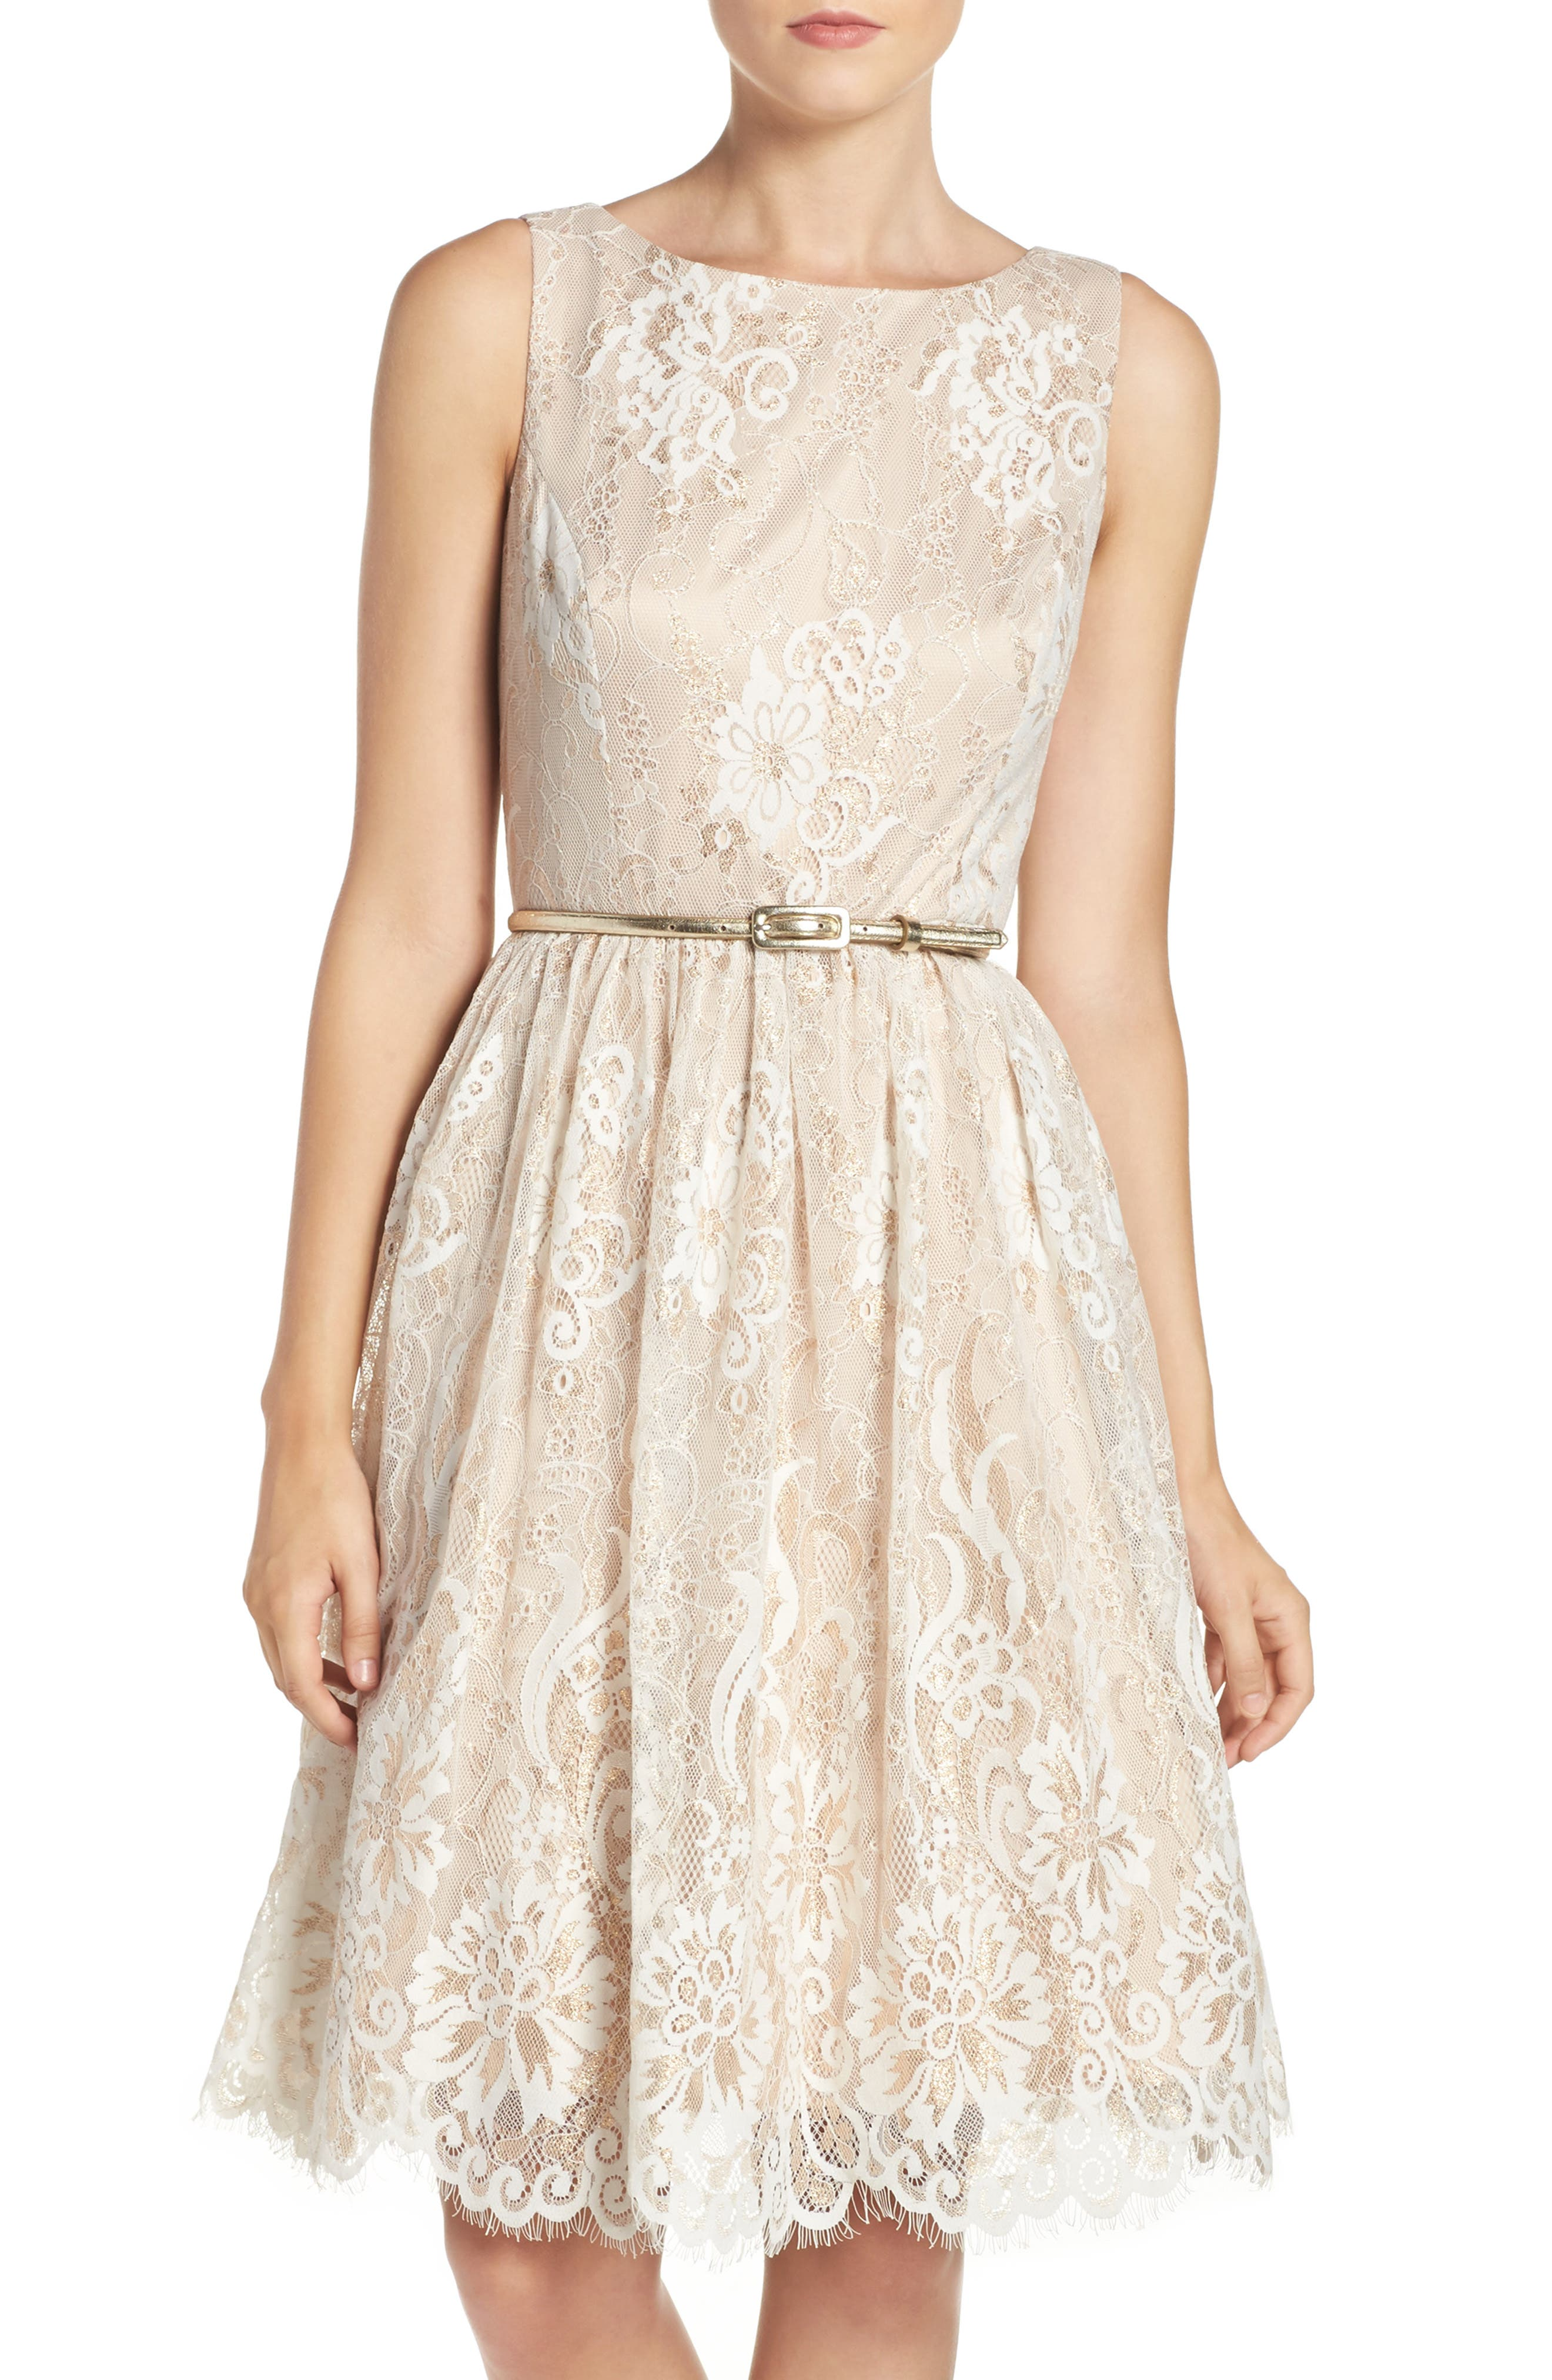 Alternate Image 1 Selected - Eliza J Belted Lace Fit & Flare Dress